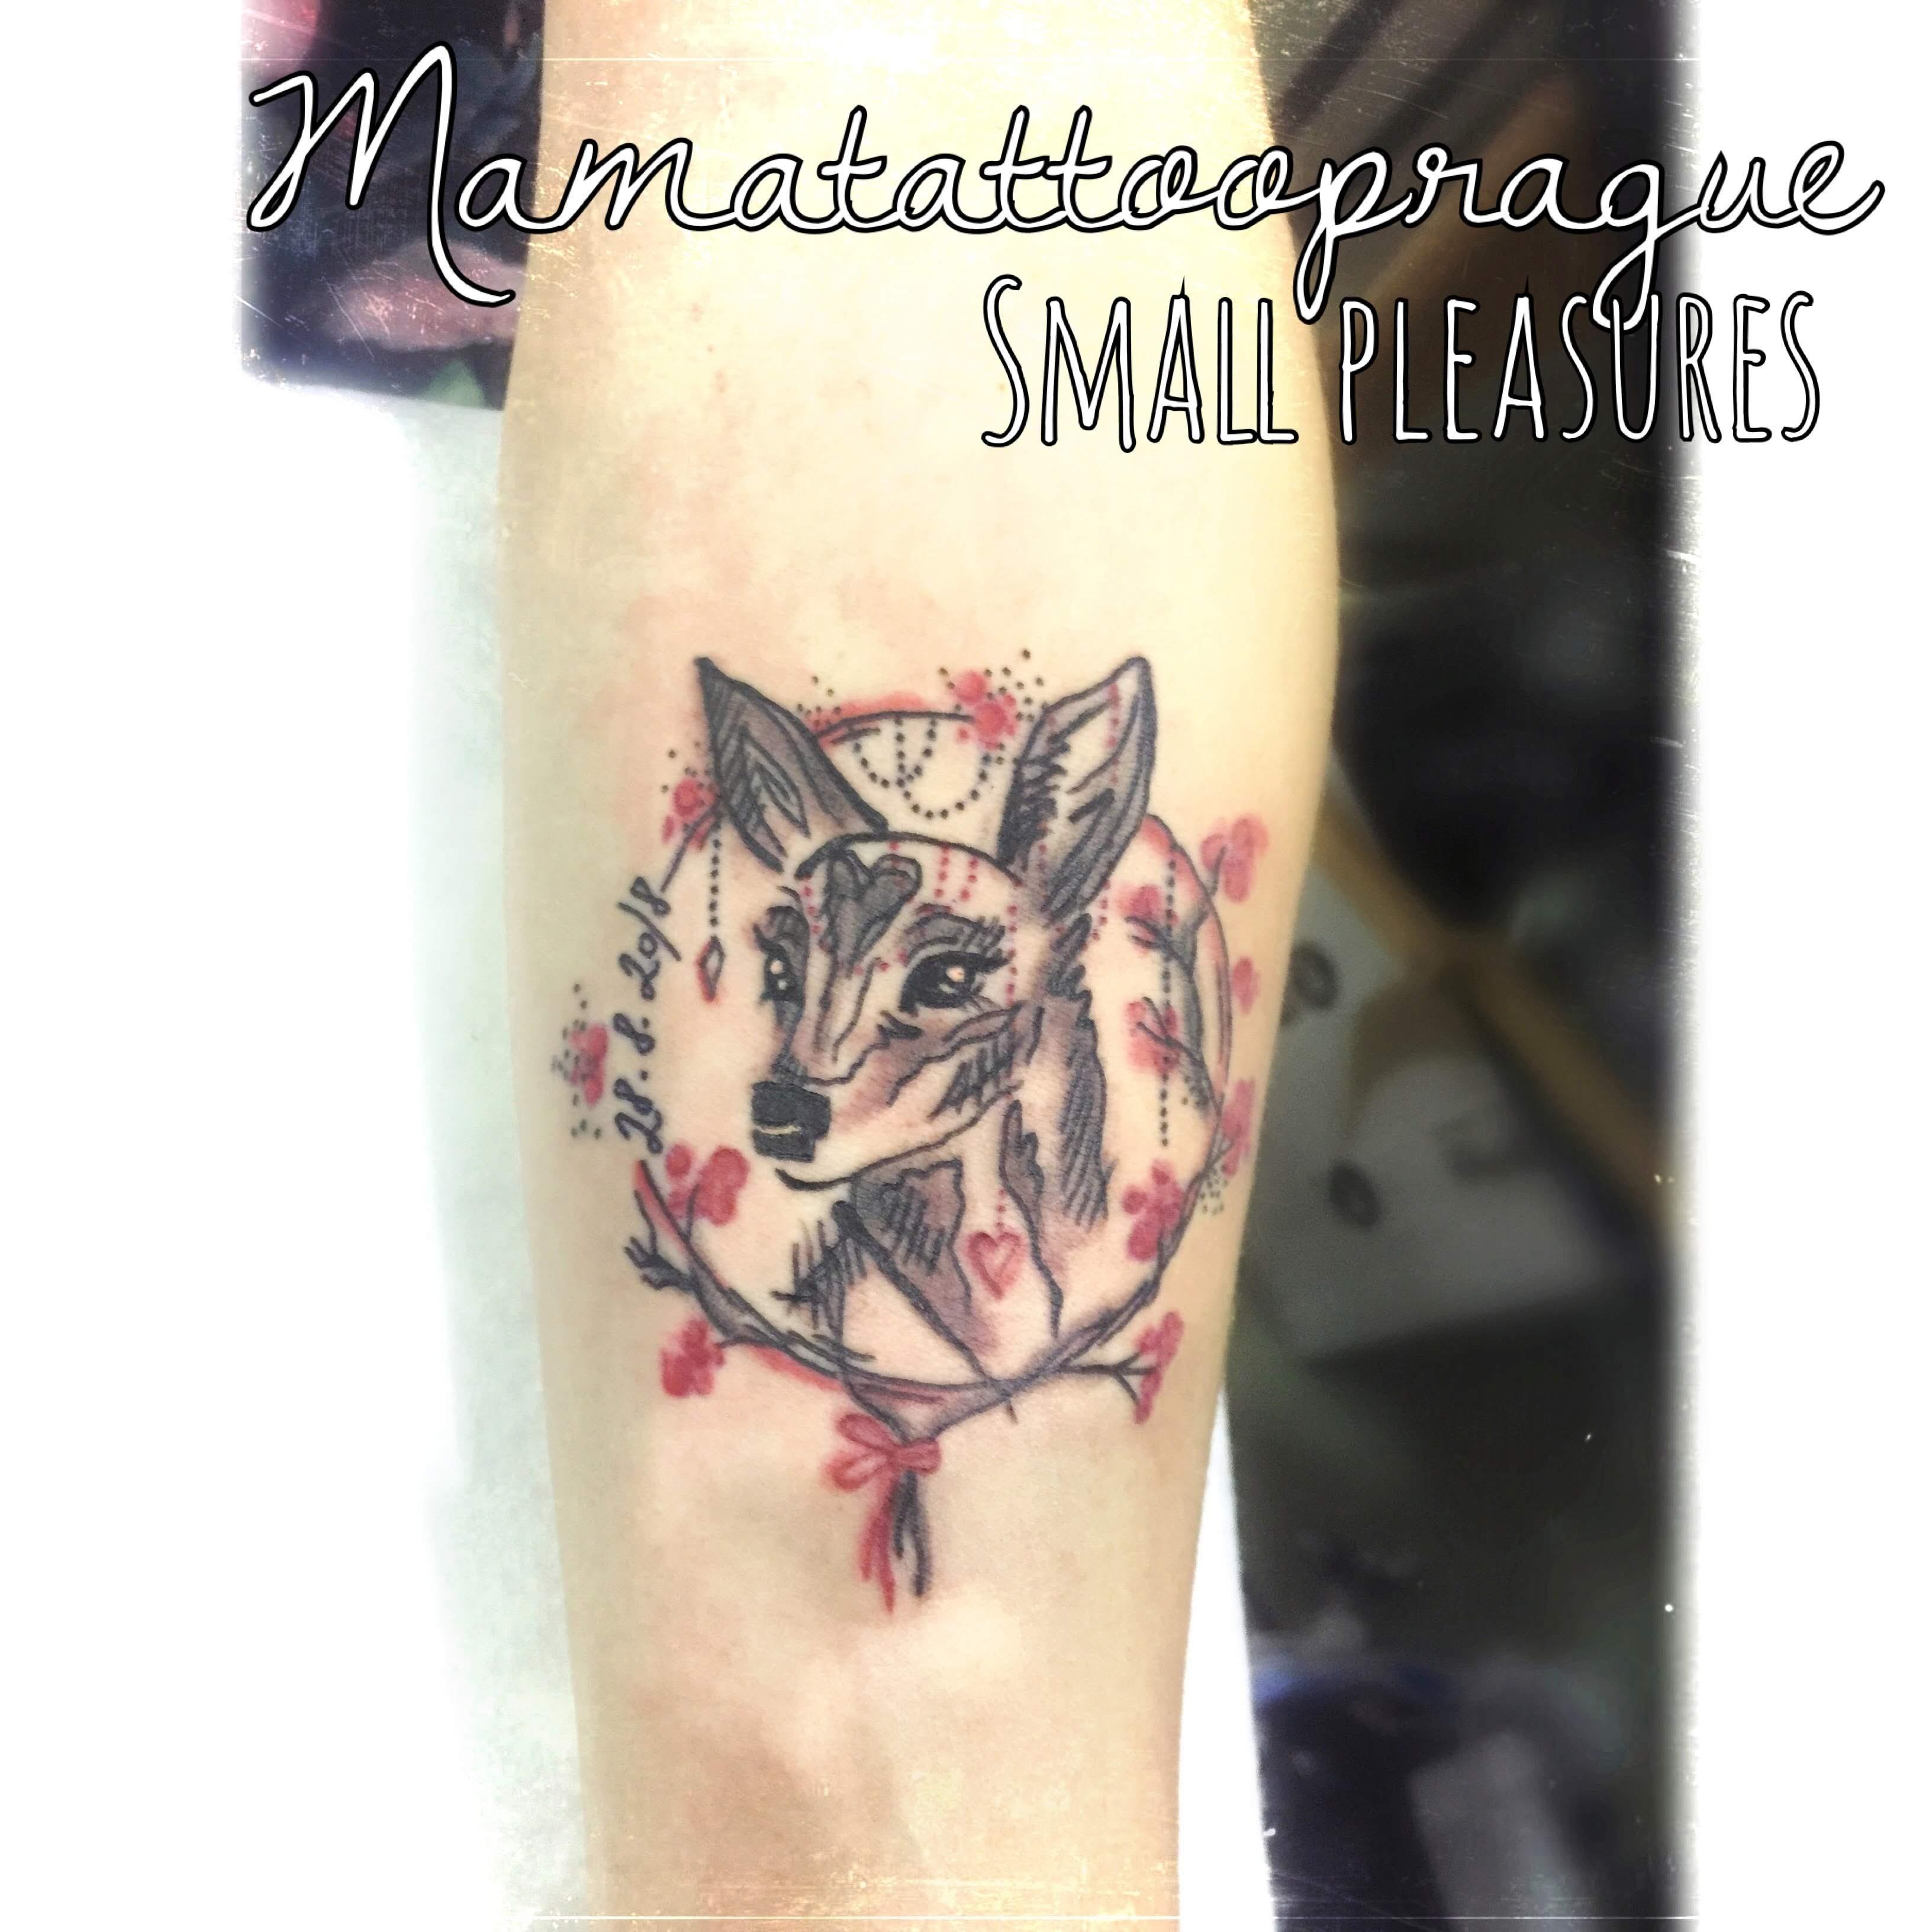 bithdate watercolor tattoo